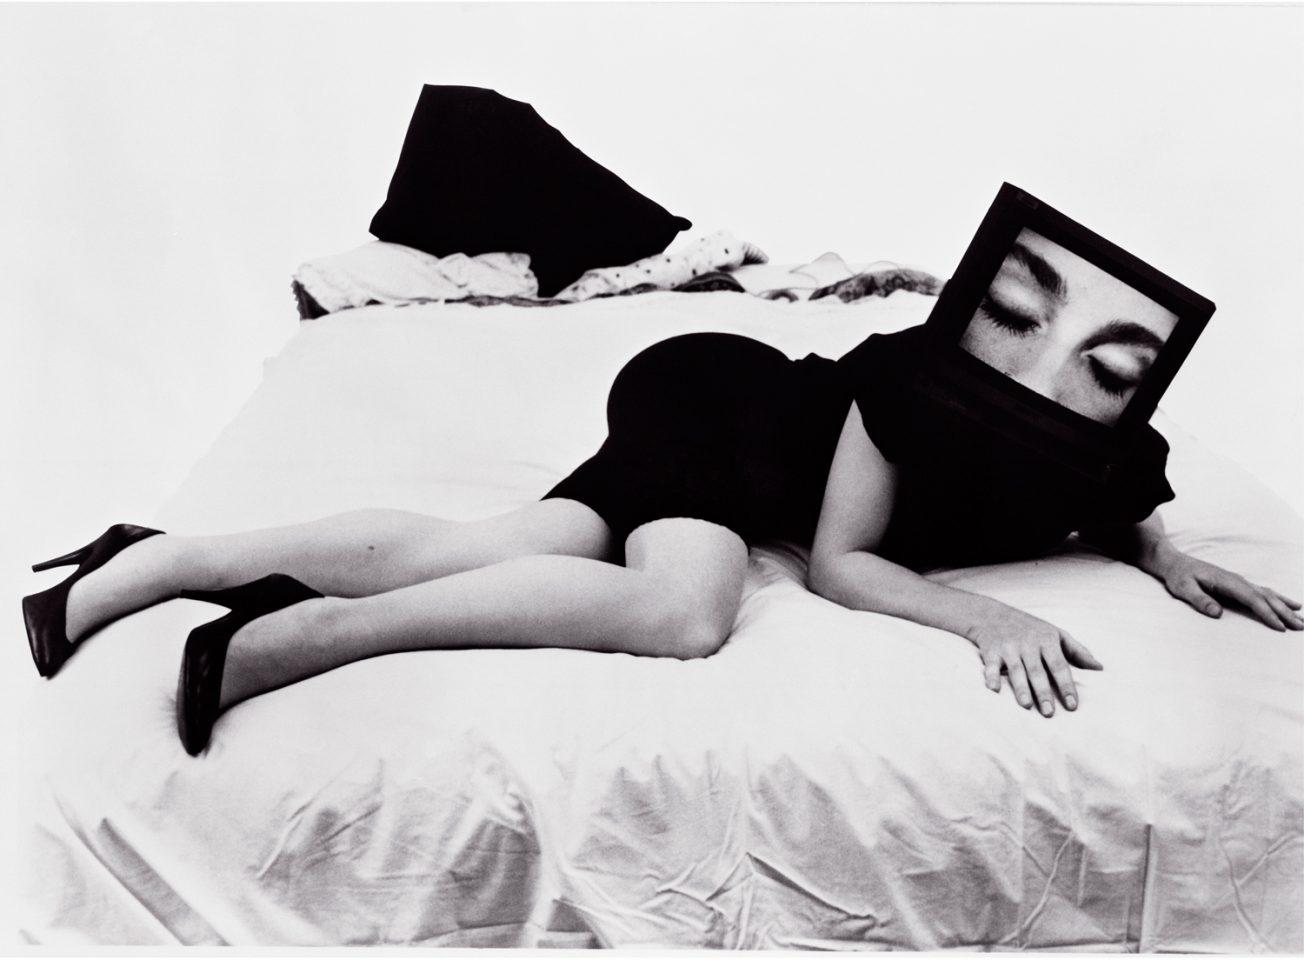 Lynn Hershman Leeson, Seduction, 1985